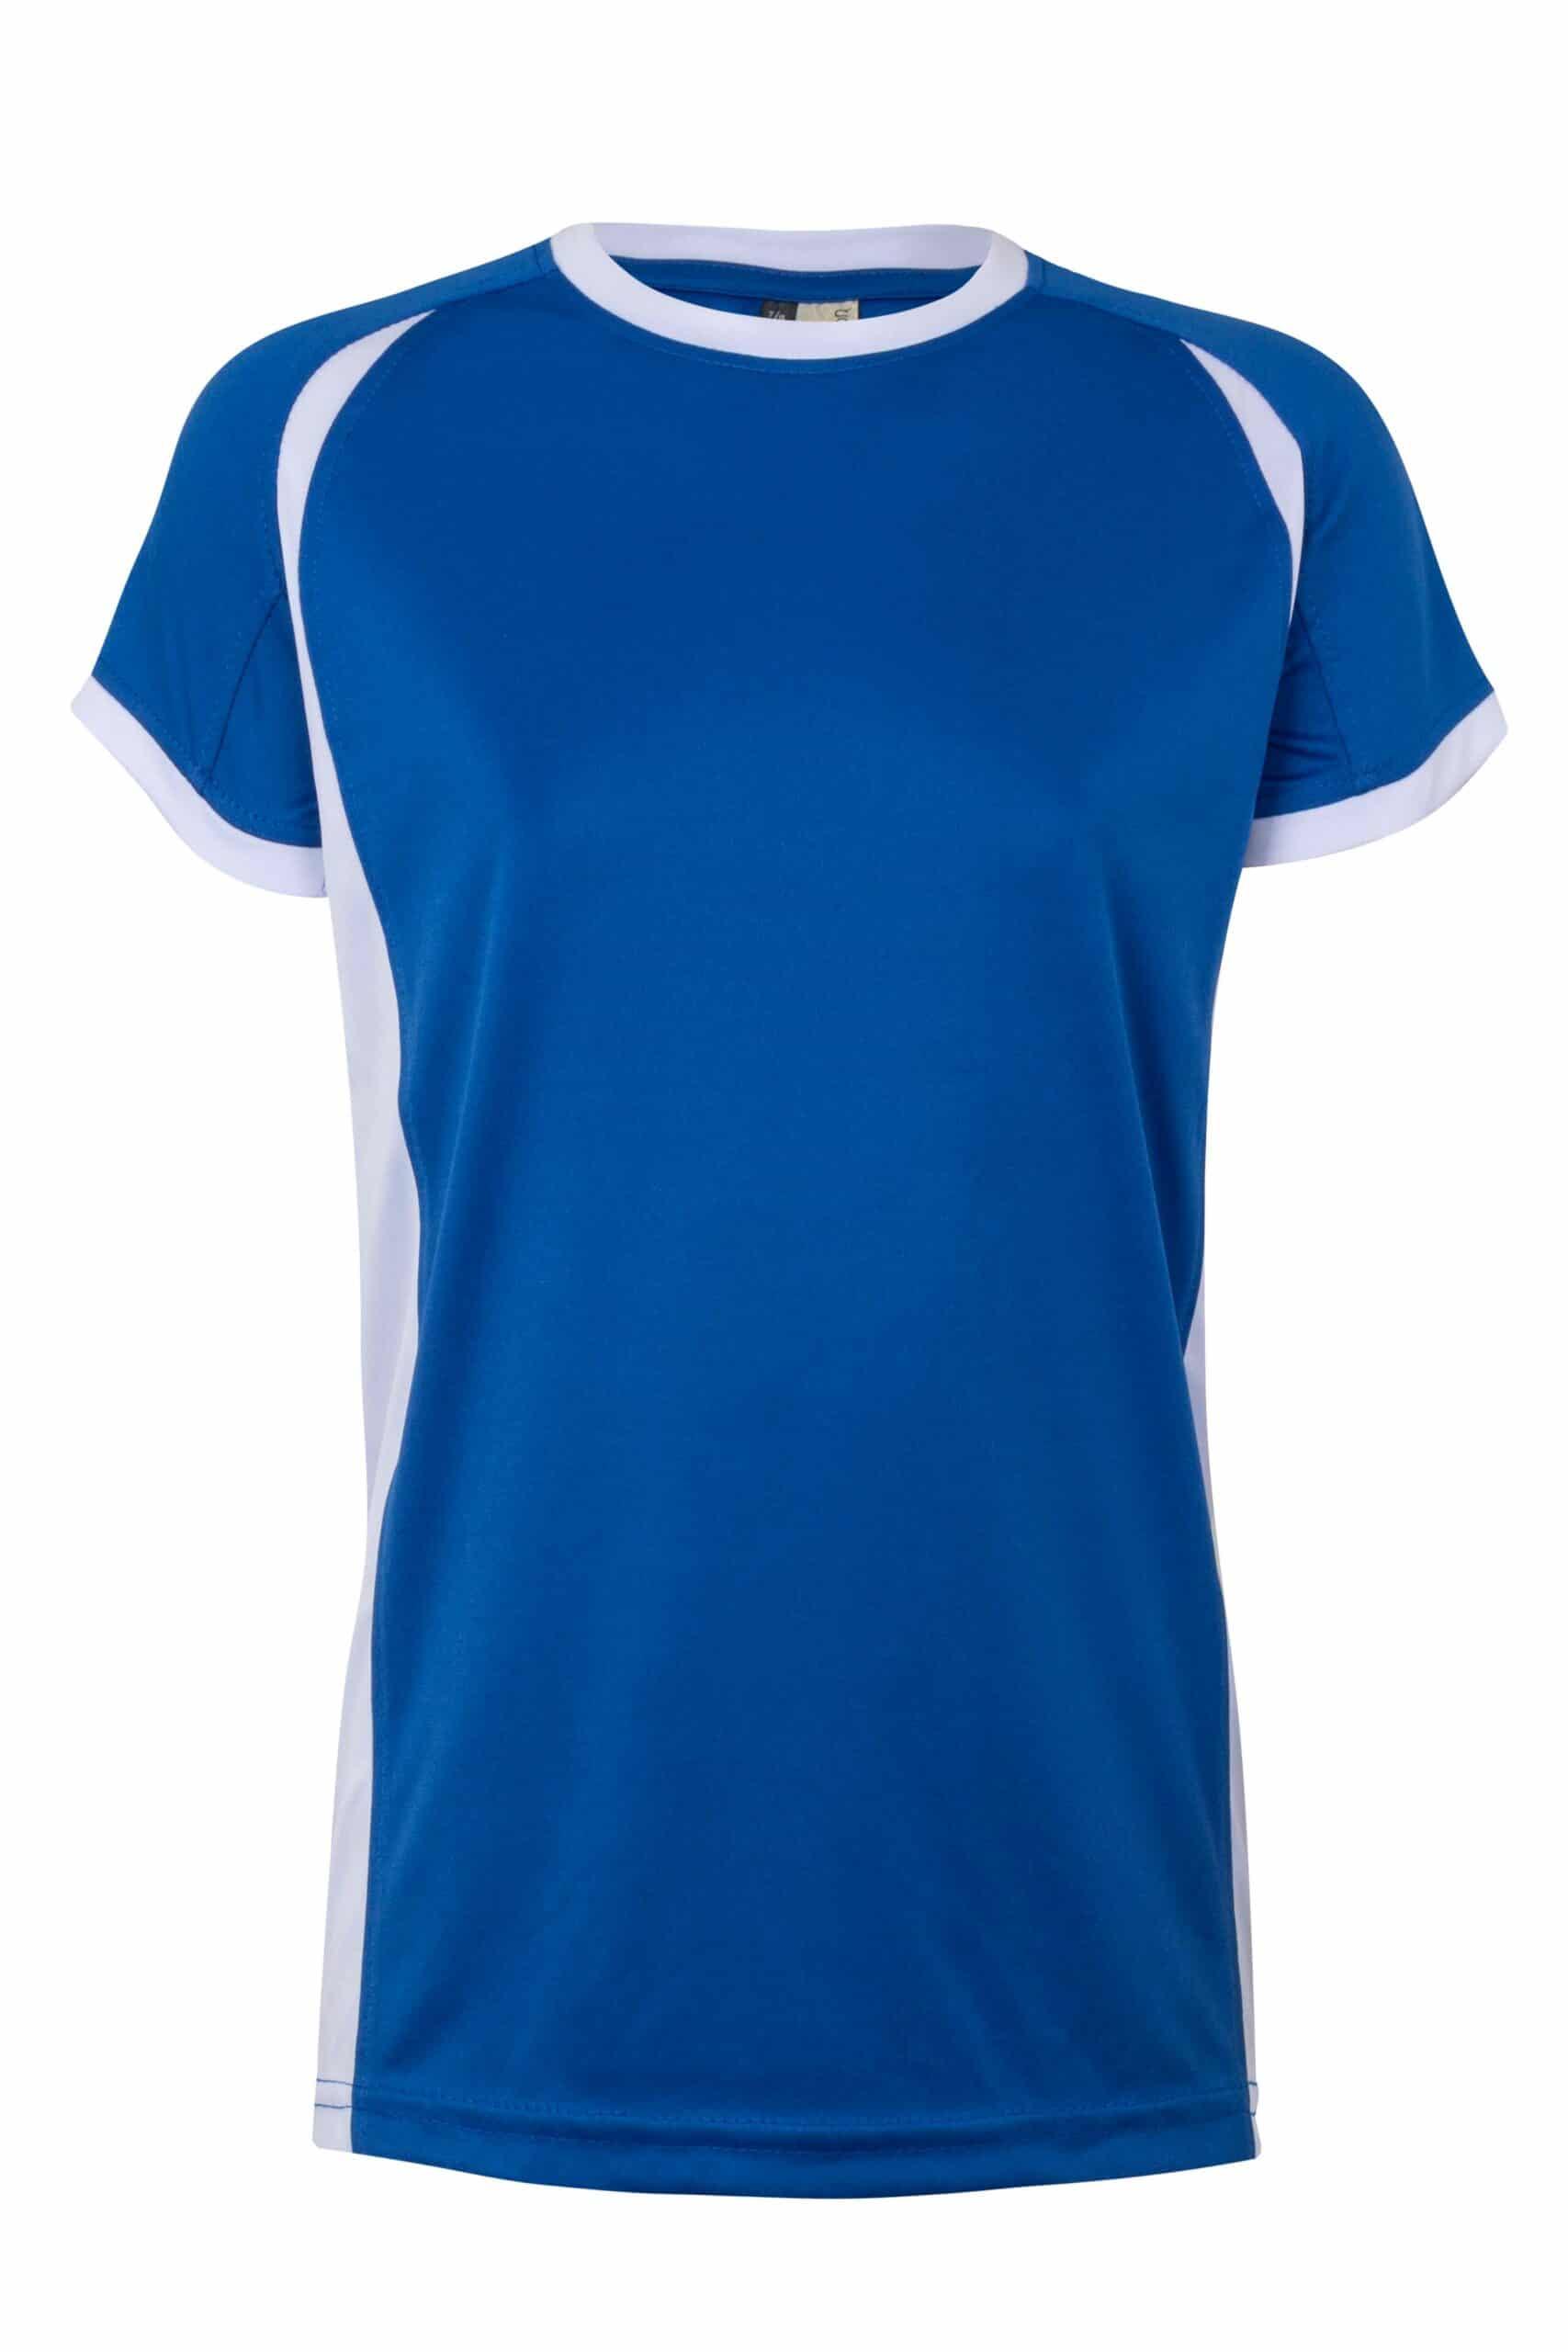 Mukua Mk531v Camiseta TÉcnica Manga Corta Bicolor NiÑo Royal Blue White 1